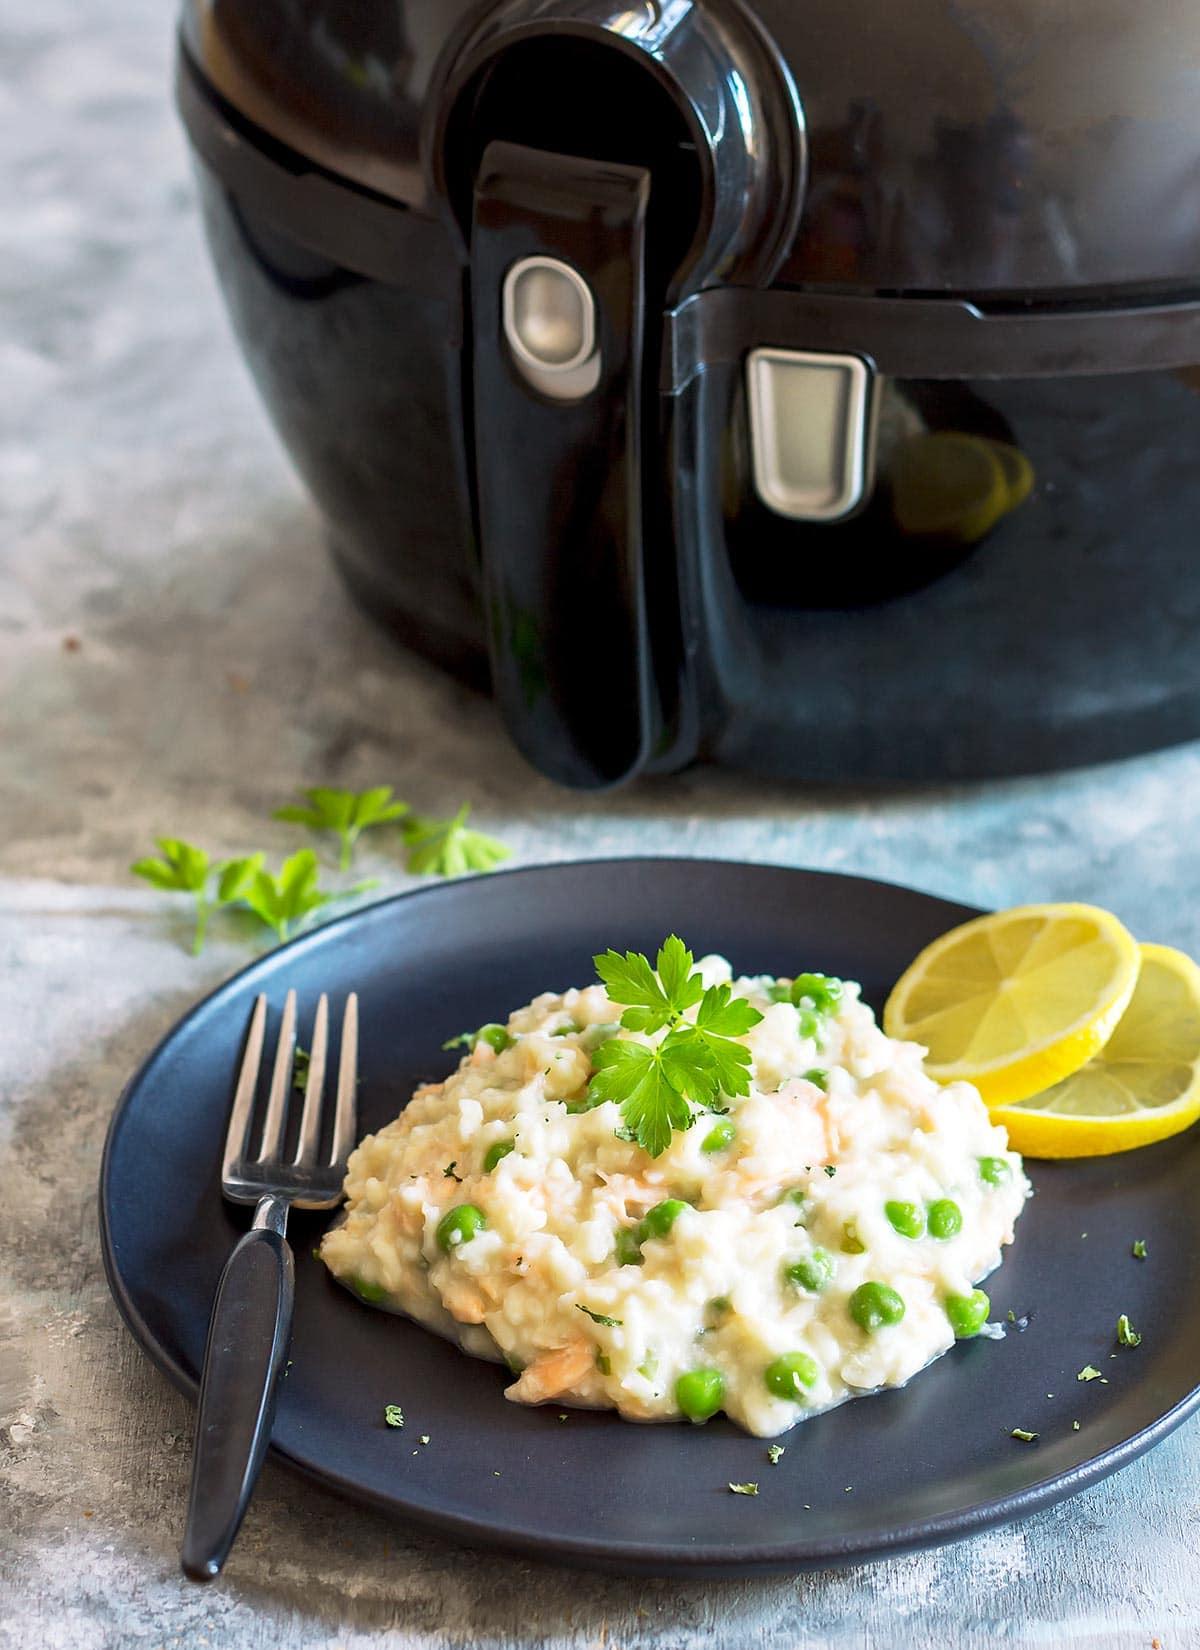 Salmon Pea Risotto on Plate